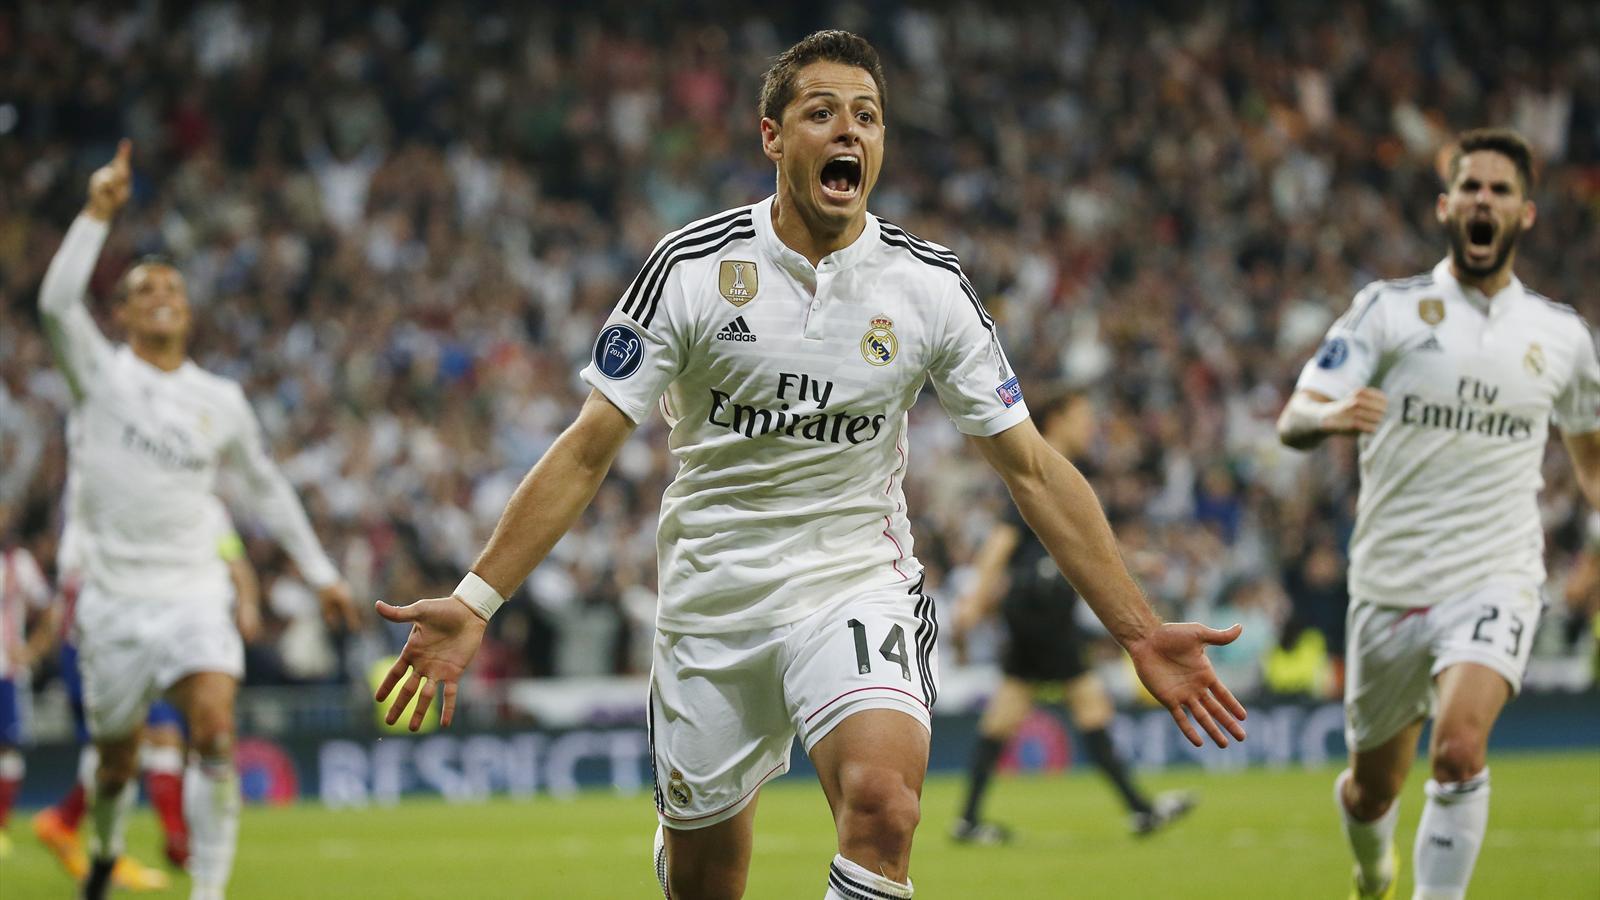 Javier Hernandez celebrates his winning goal for Real Madrid against Atletico Madrid